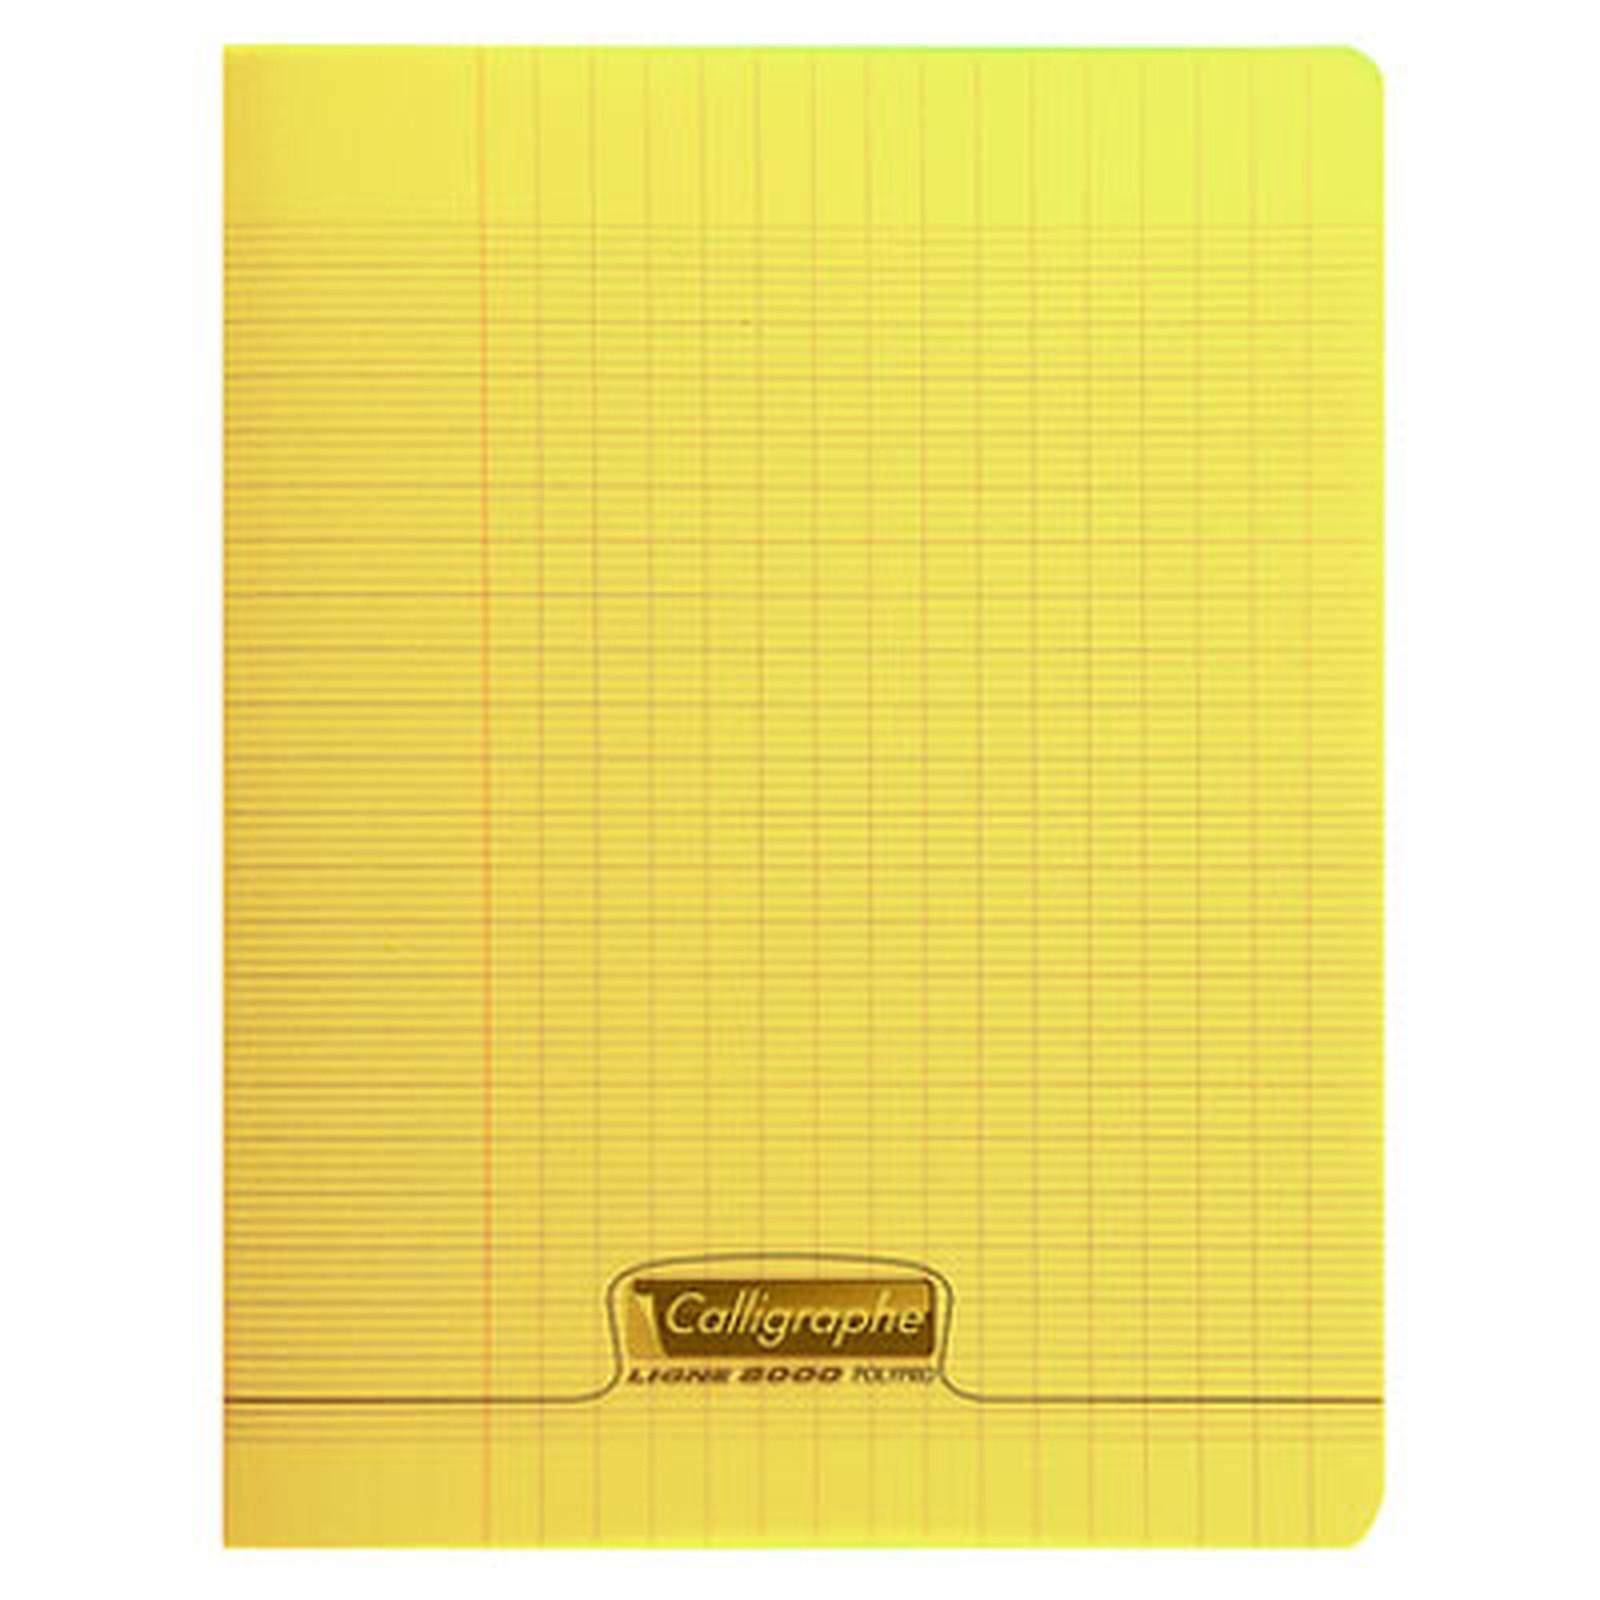 Calligraphe 8000 Polypro Cahier 96 pages 17 x 22 cm seyes grands carreaux Jaune